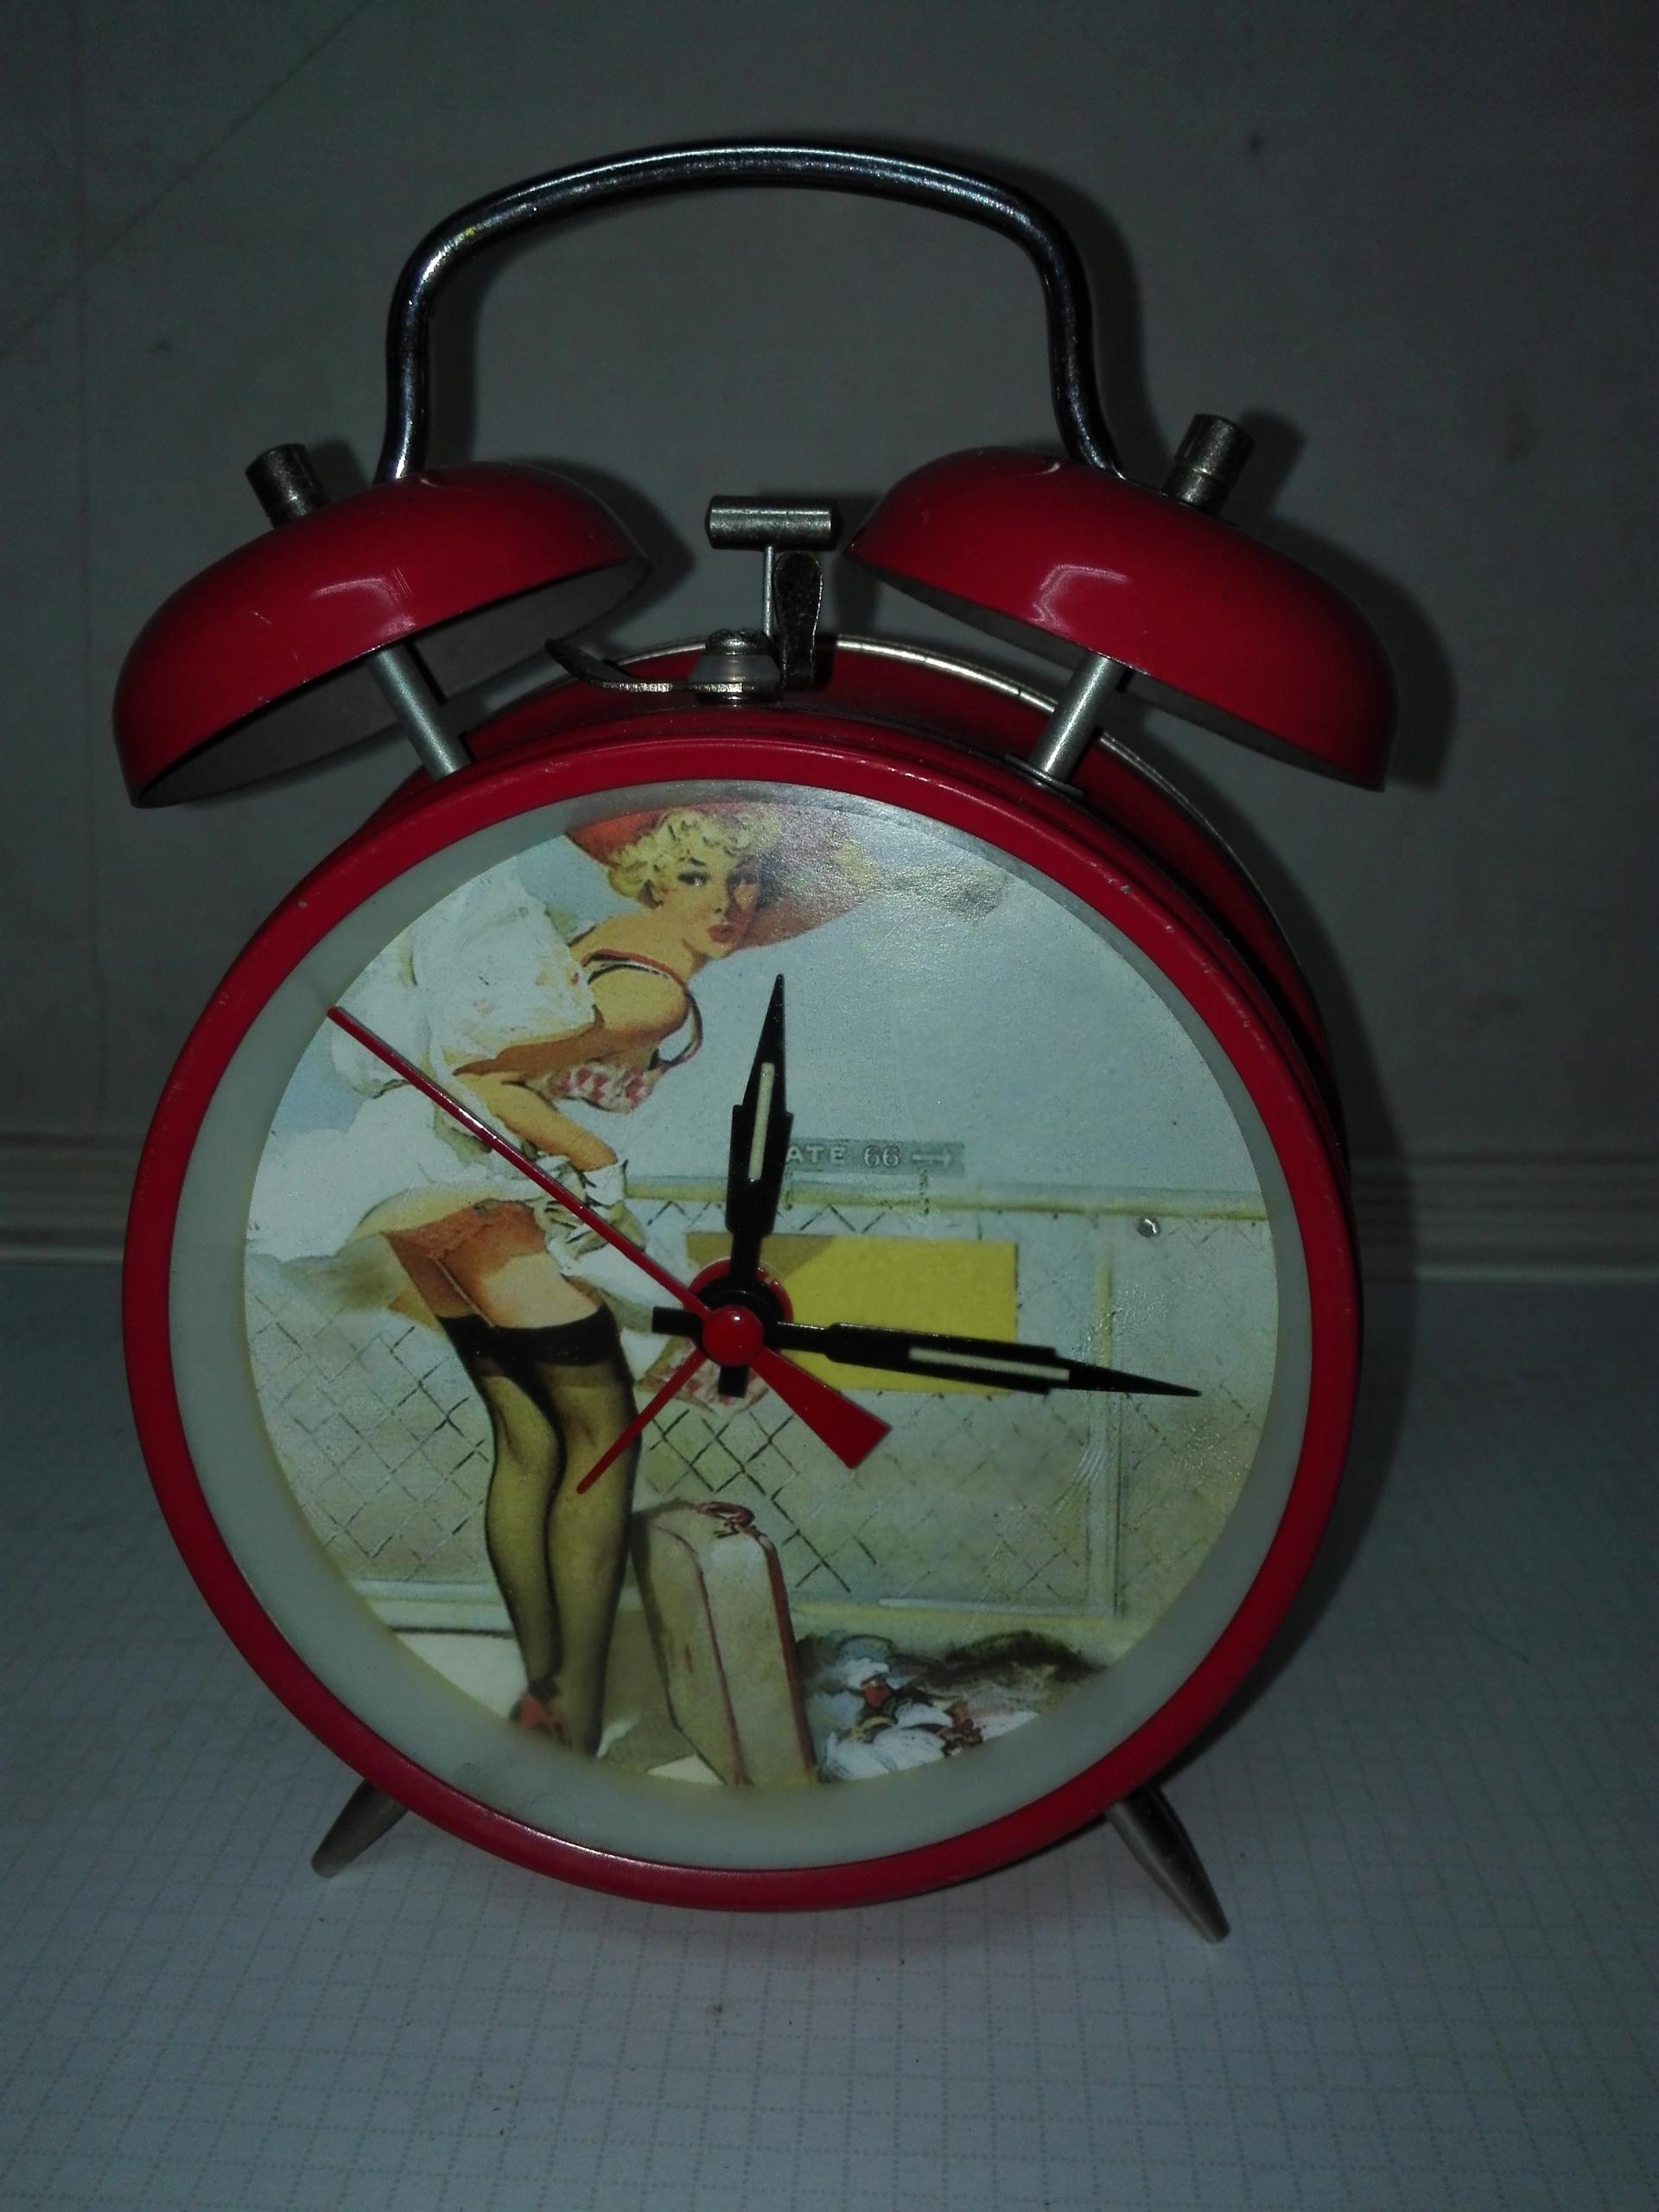 Zegar budzik stylizowany na lata 50 USA